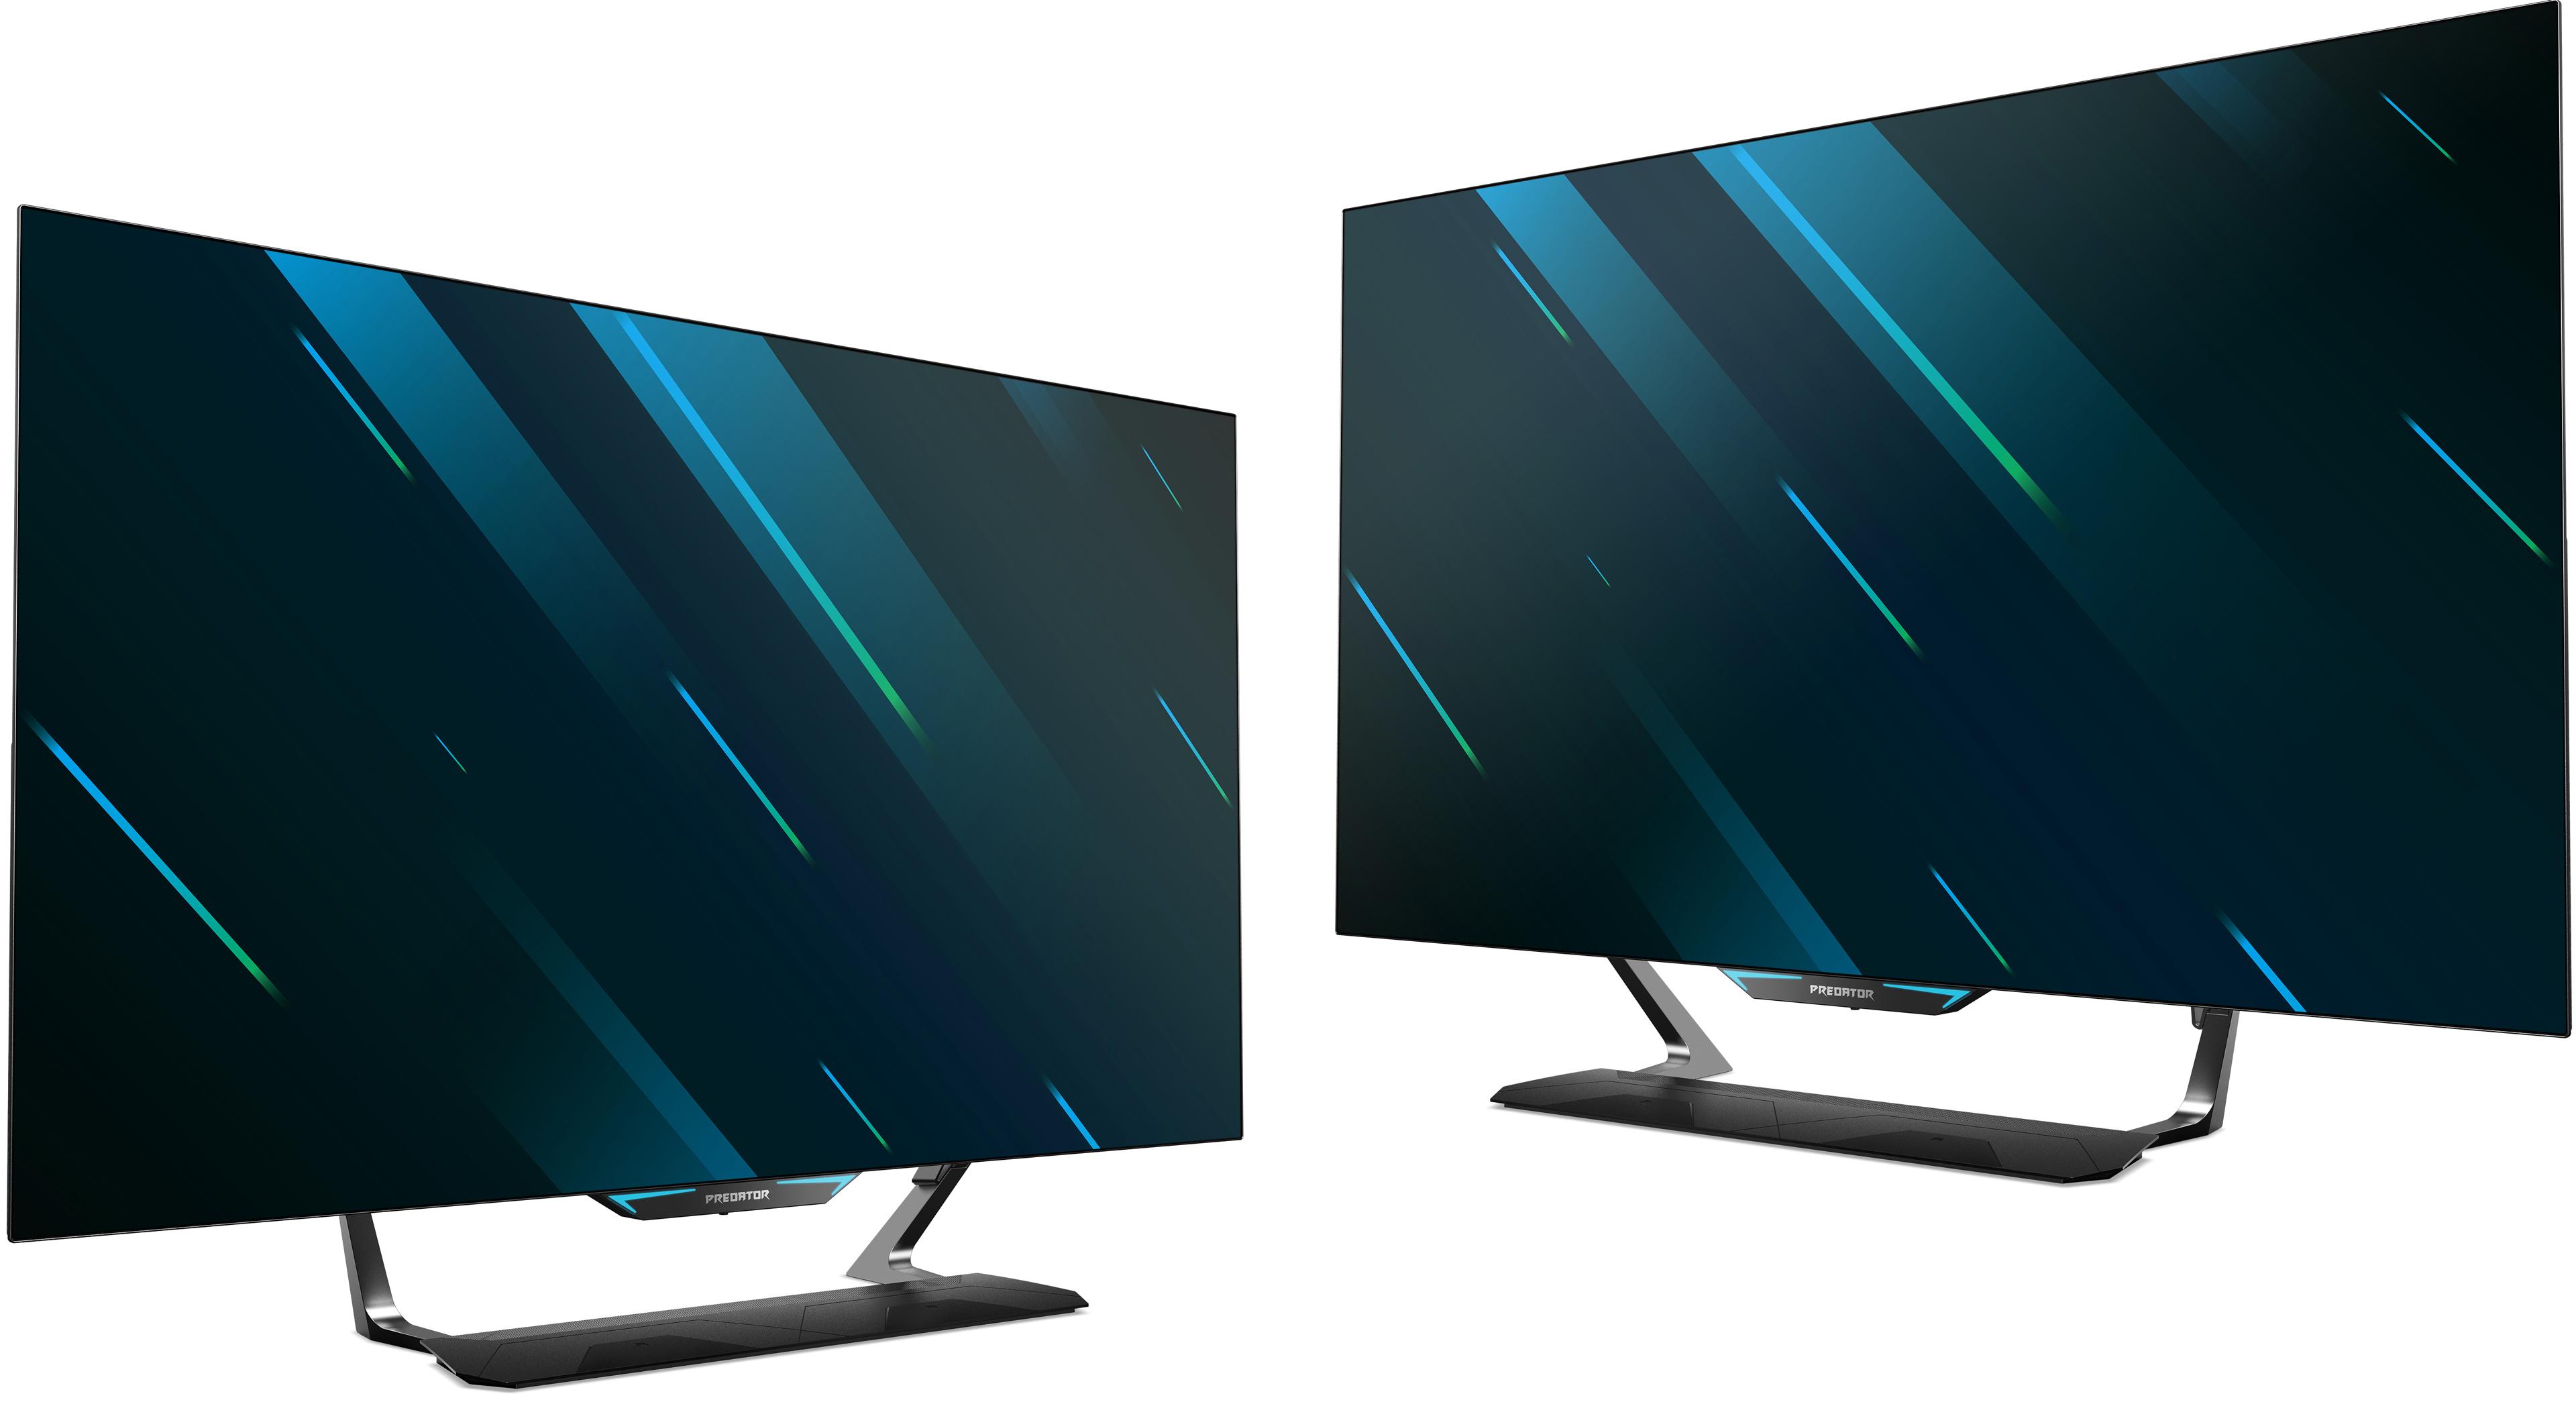 Acer announces three Predator gaming monitors at CES 2020